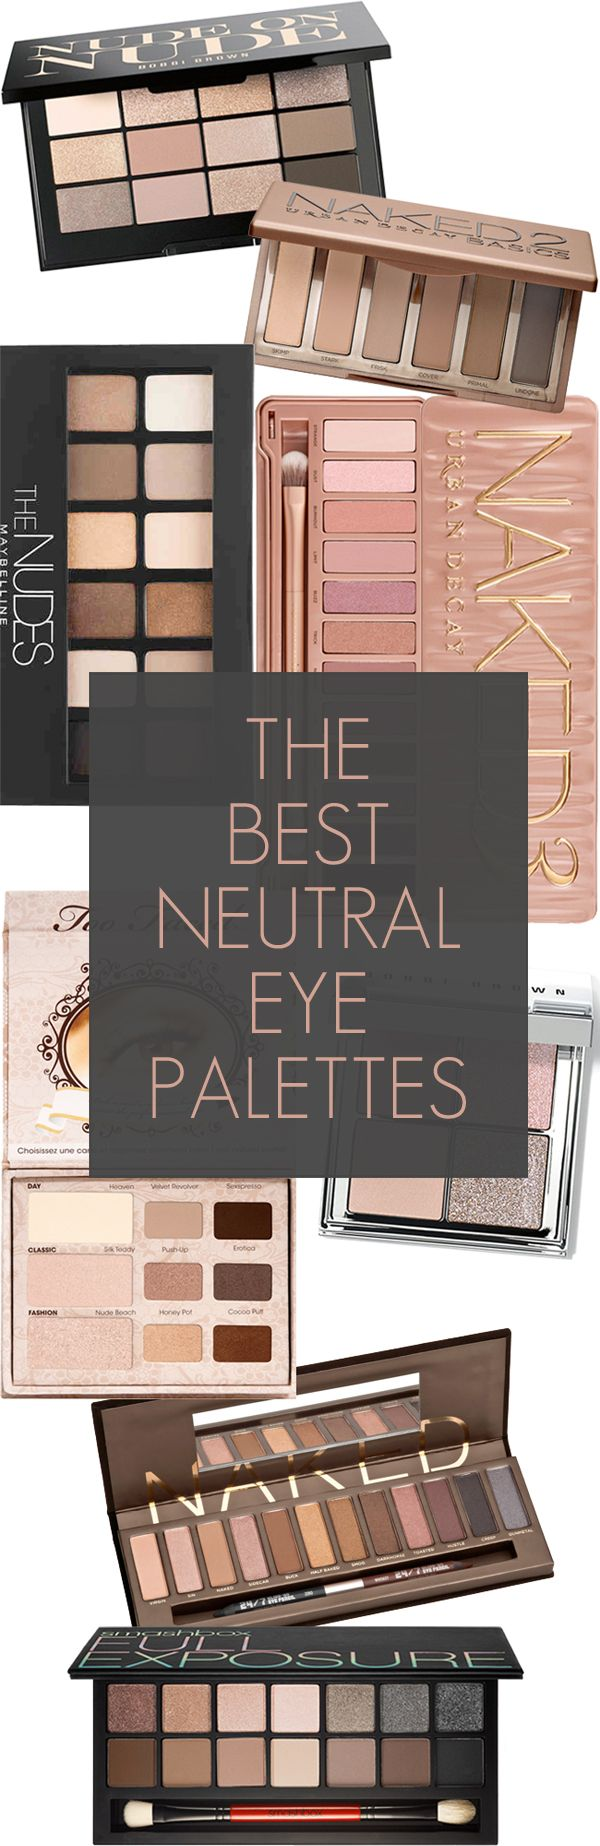 I'm a fan of neutral makeup especially eyeshadow! Bobbi